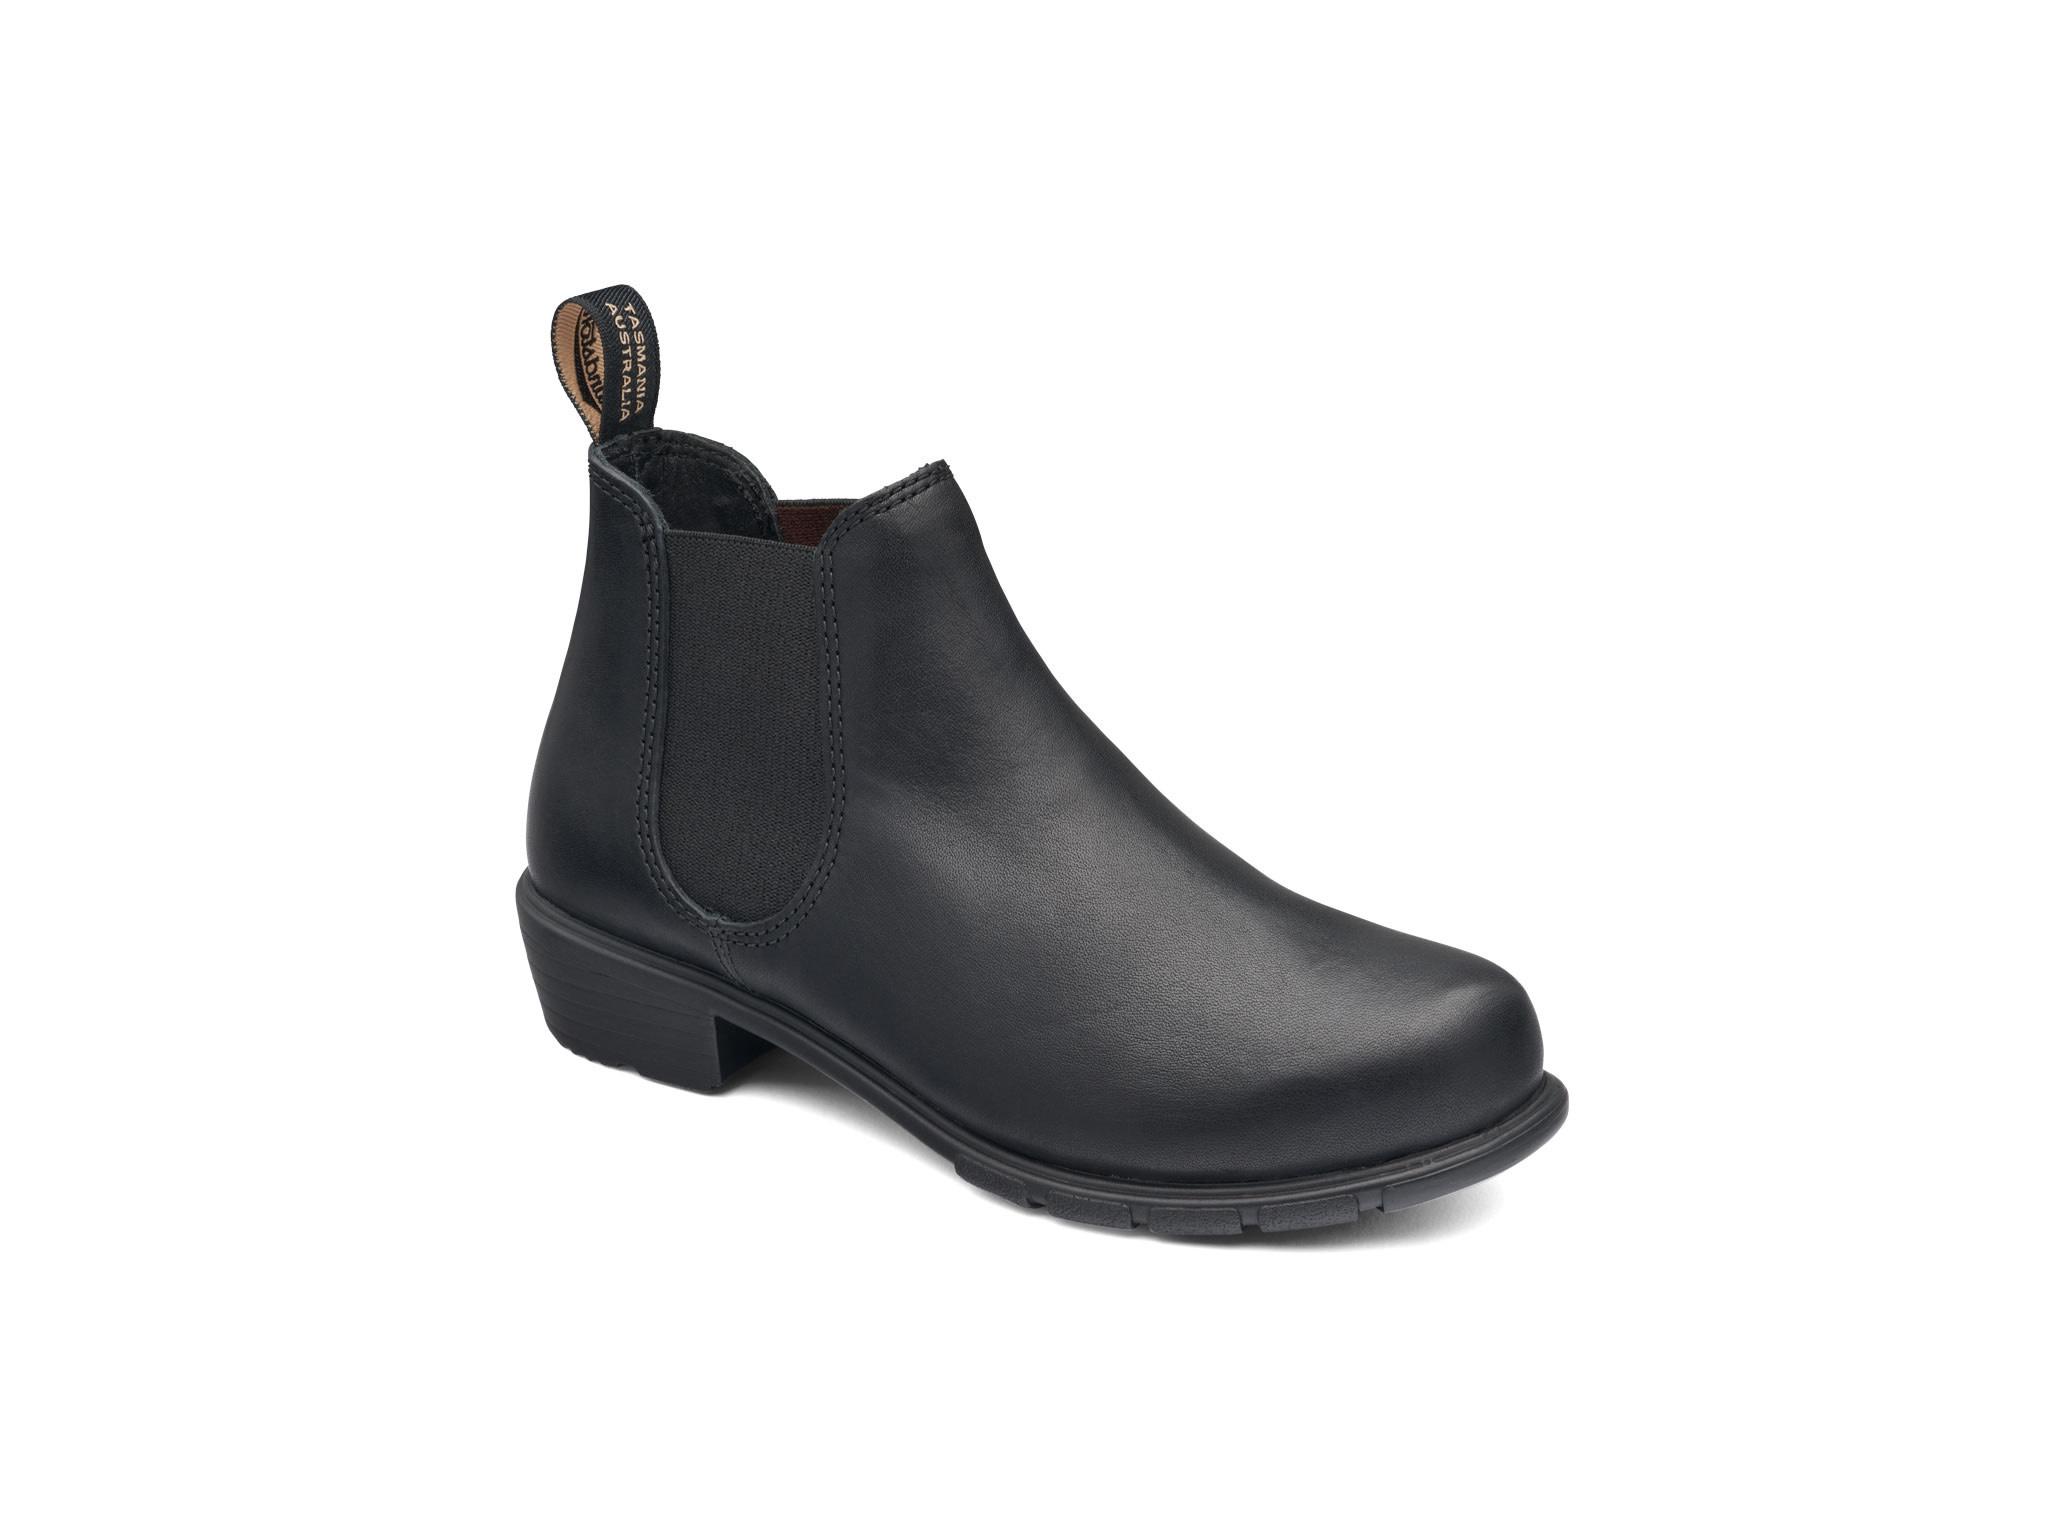 Blundstone Blundstone Women's Series Low Heel 2068 - Black